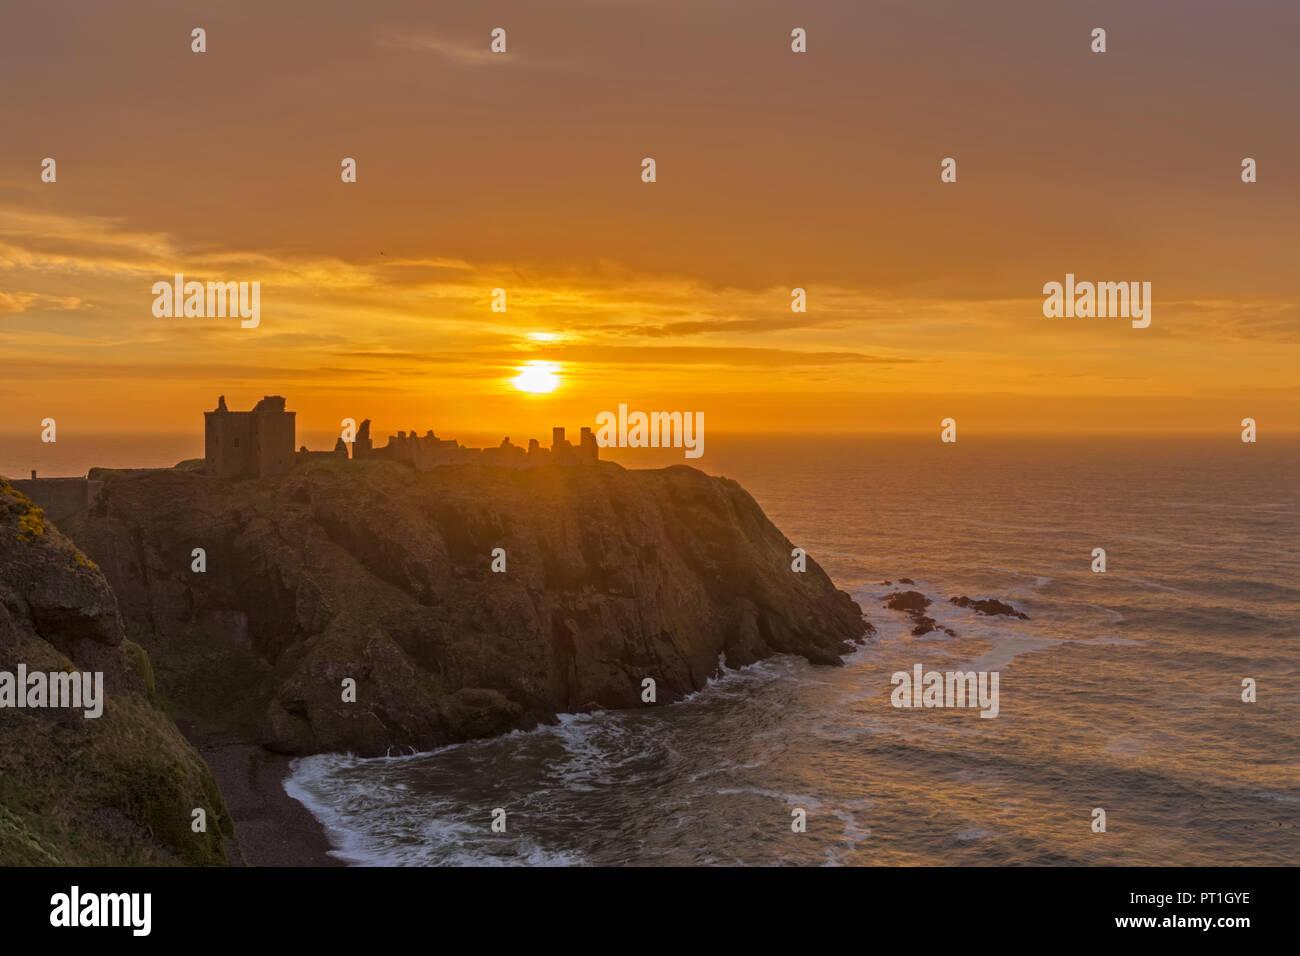 UK, Scotland, Stonehaven, Dunnottar Castle at sunrise - Stock Image